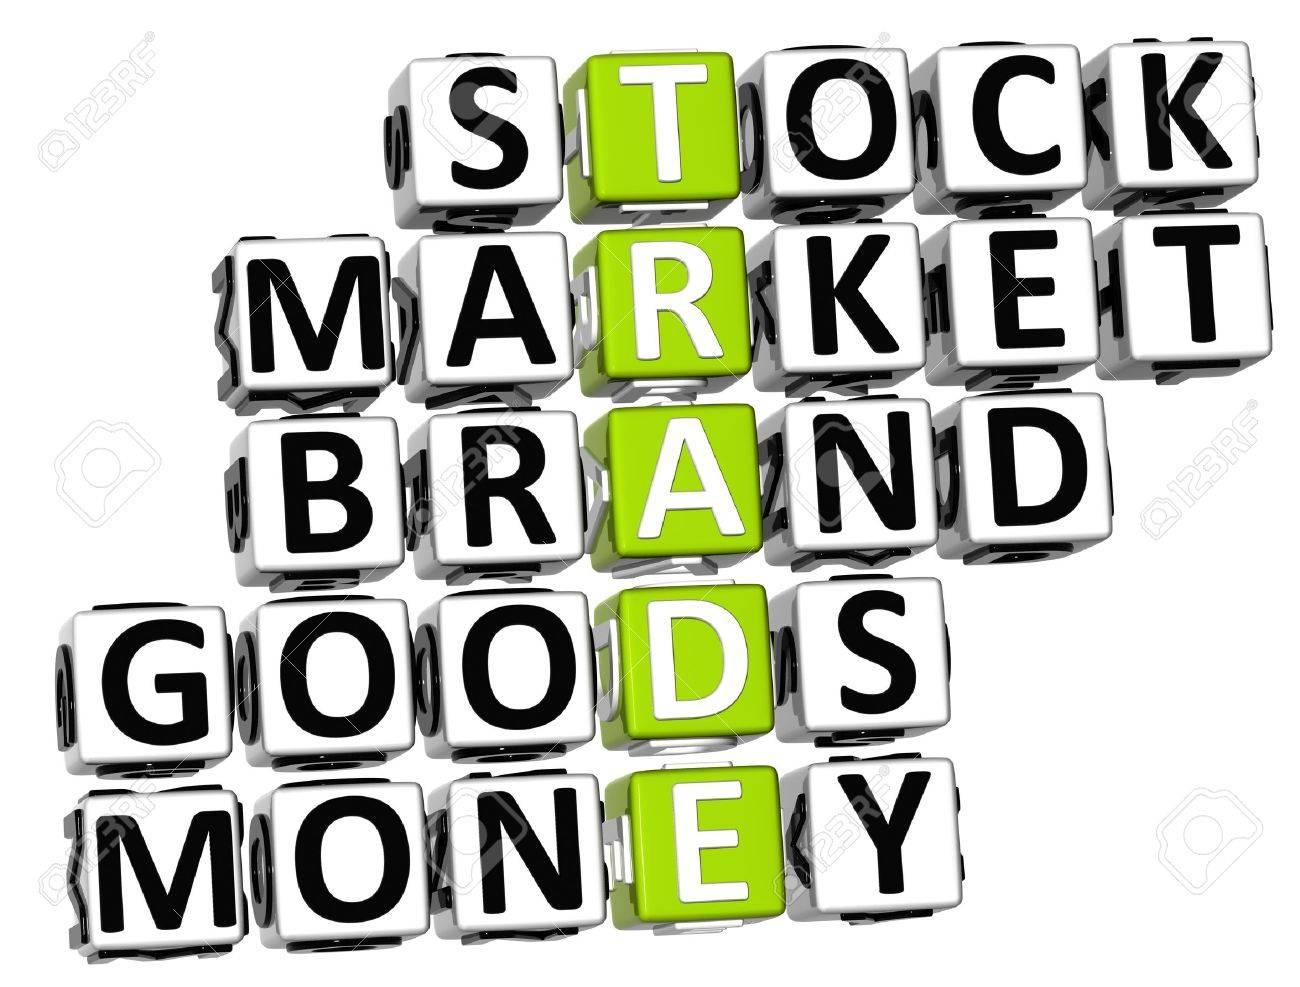 3D Trade Market Stock Crossword on white background Stock Photo - 9753161